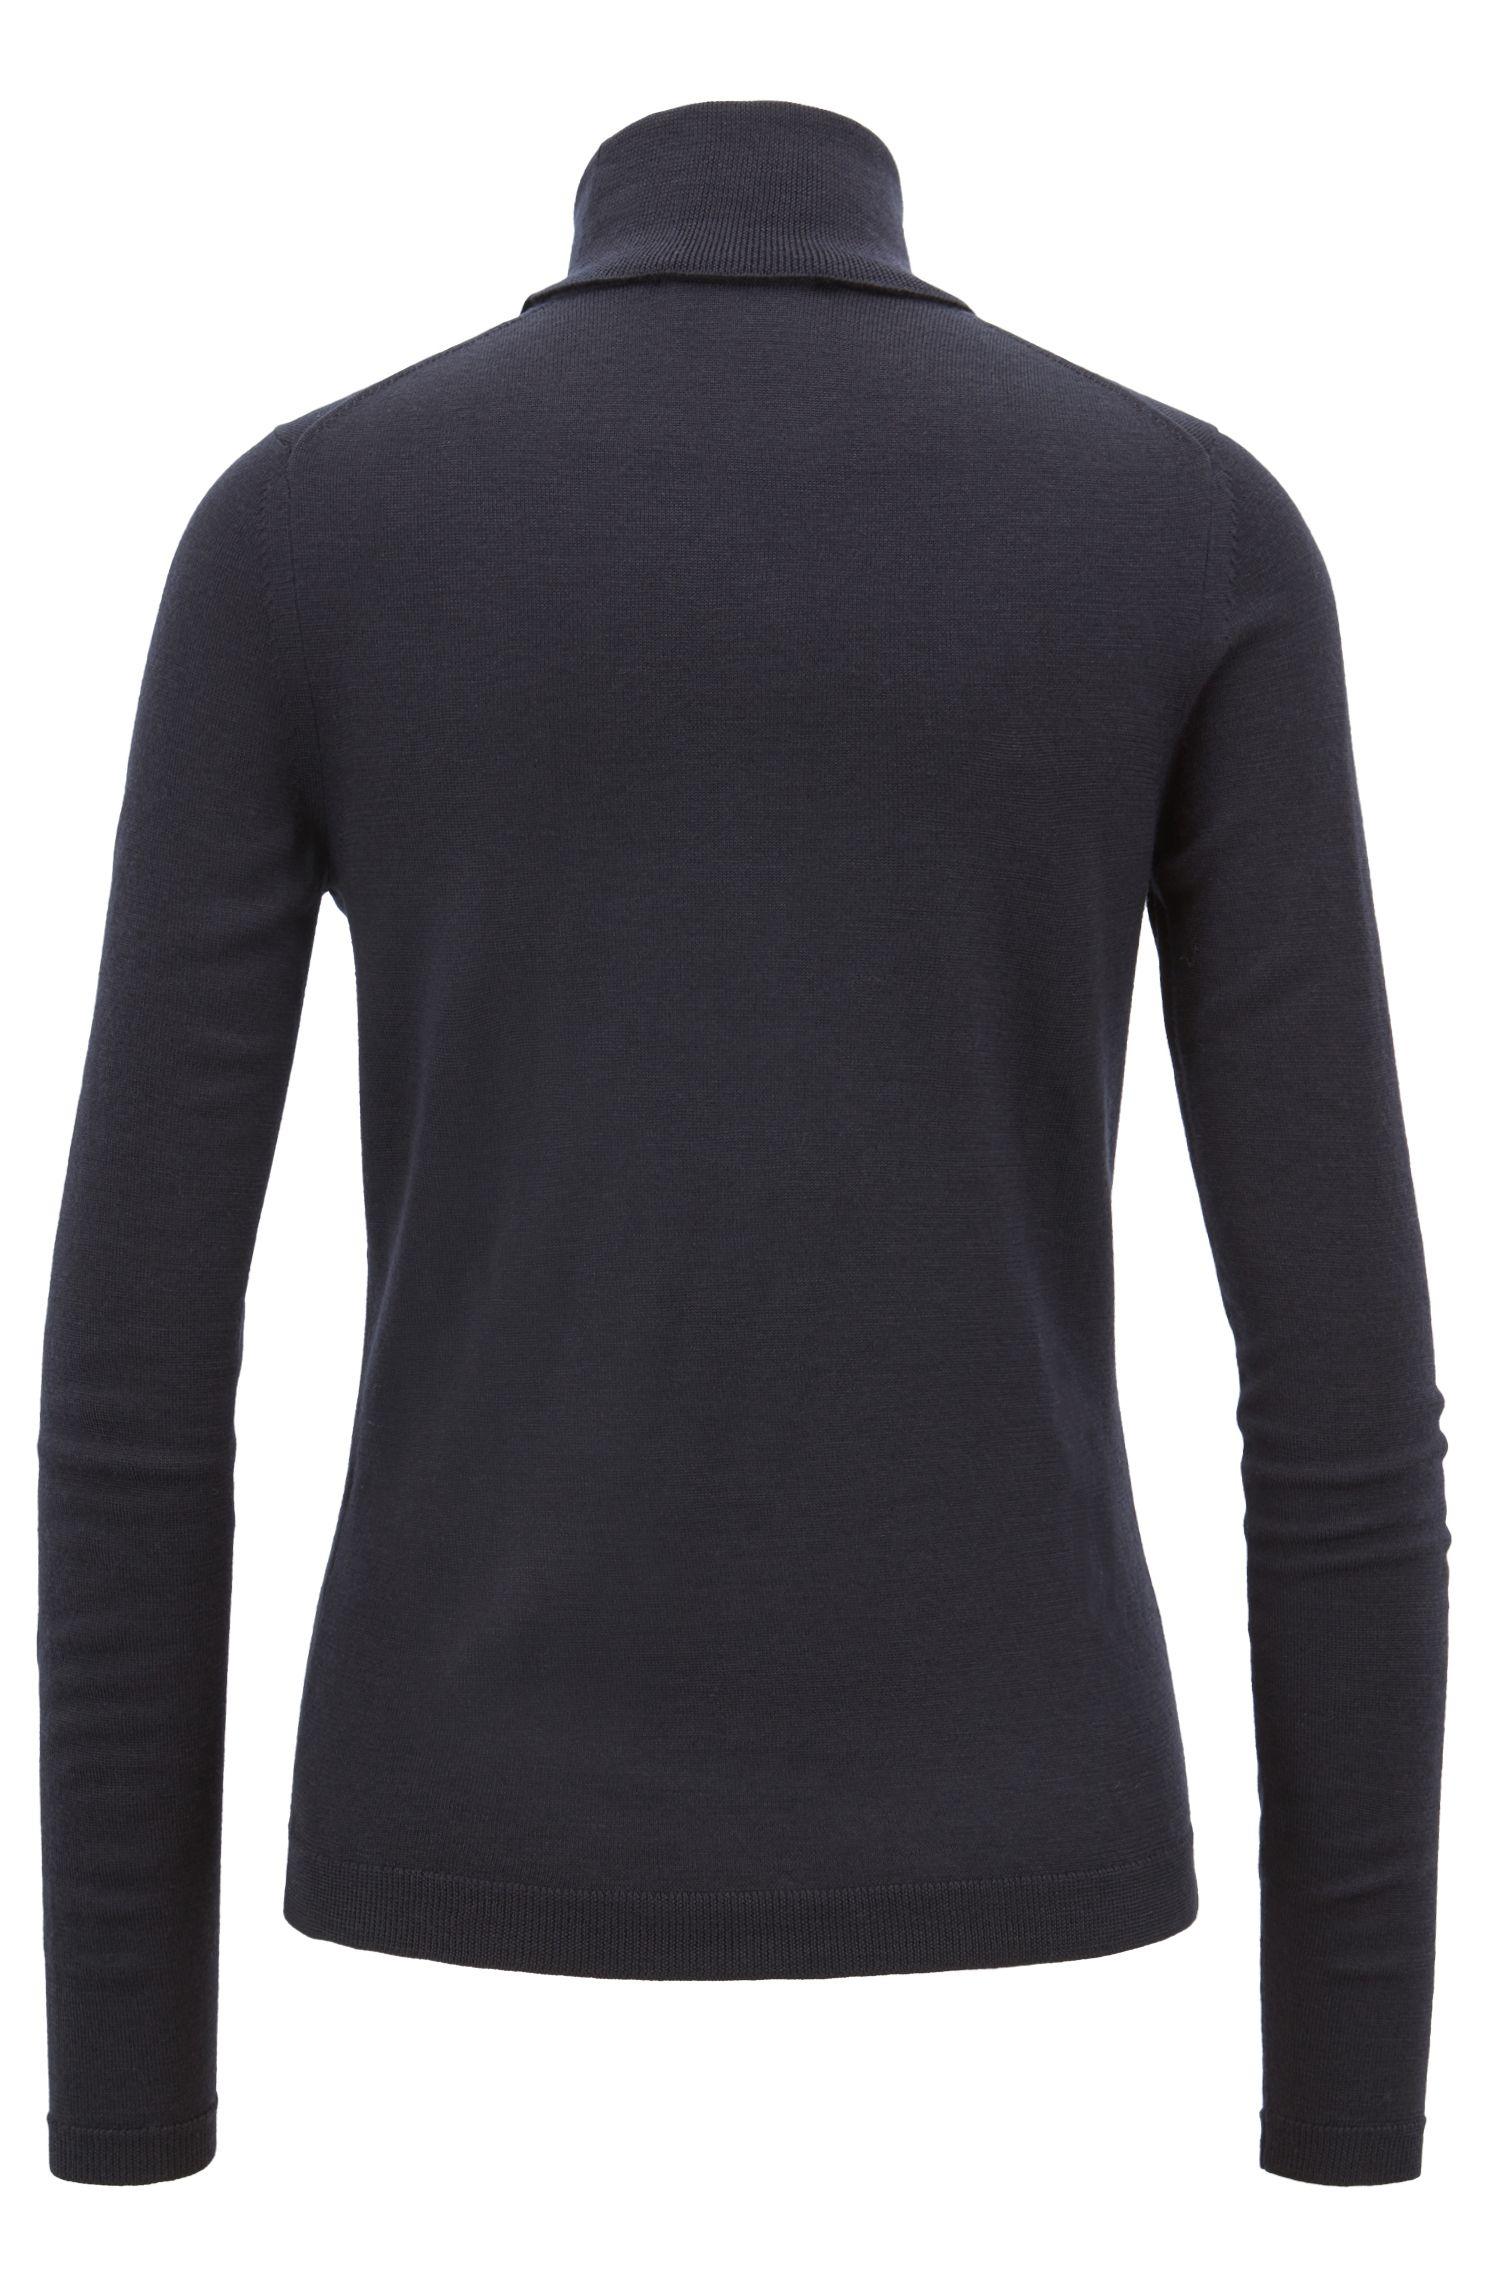 Gallery Collection roll-neck sweater in mercerized virgin wool, Open Blue